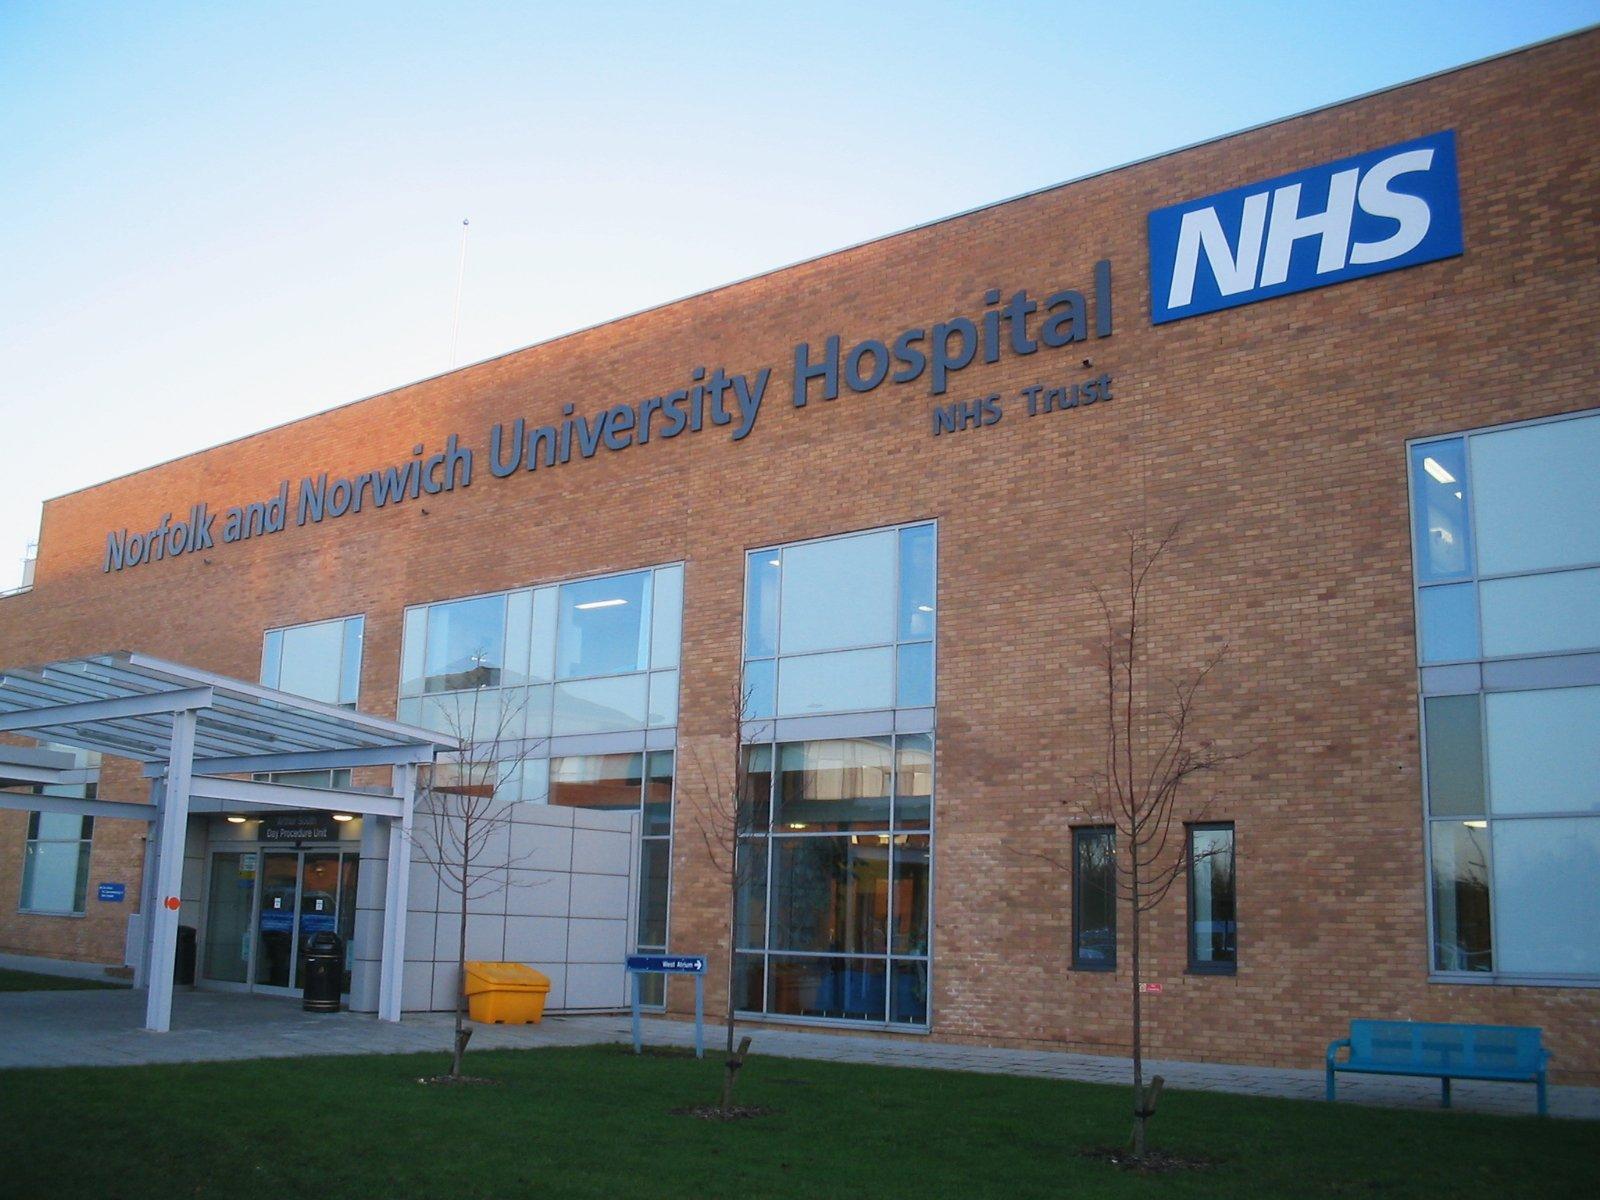 UK NHS Hospital